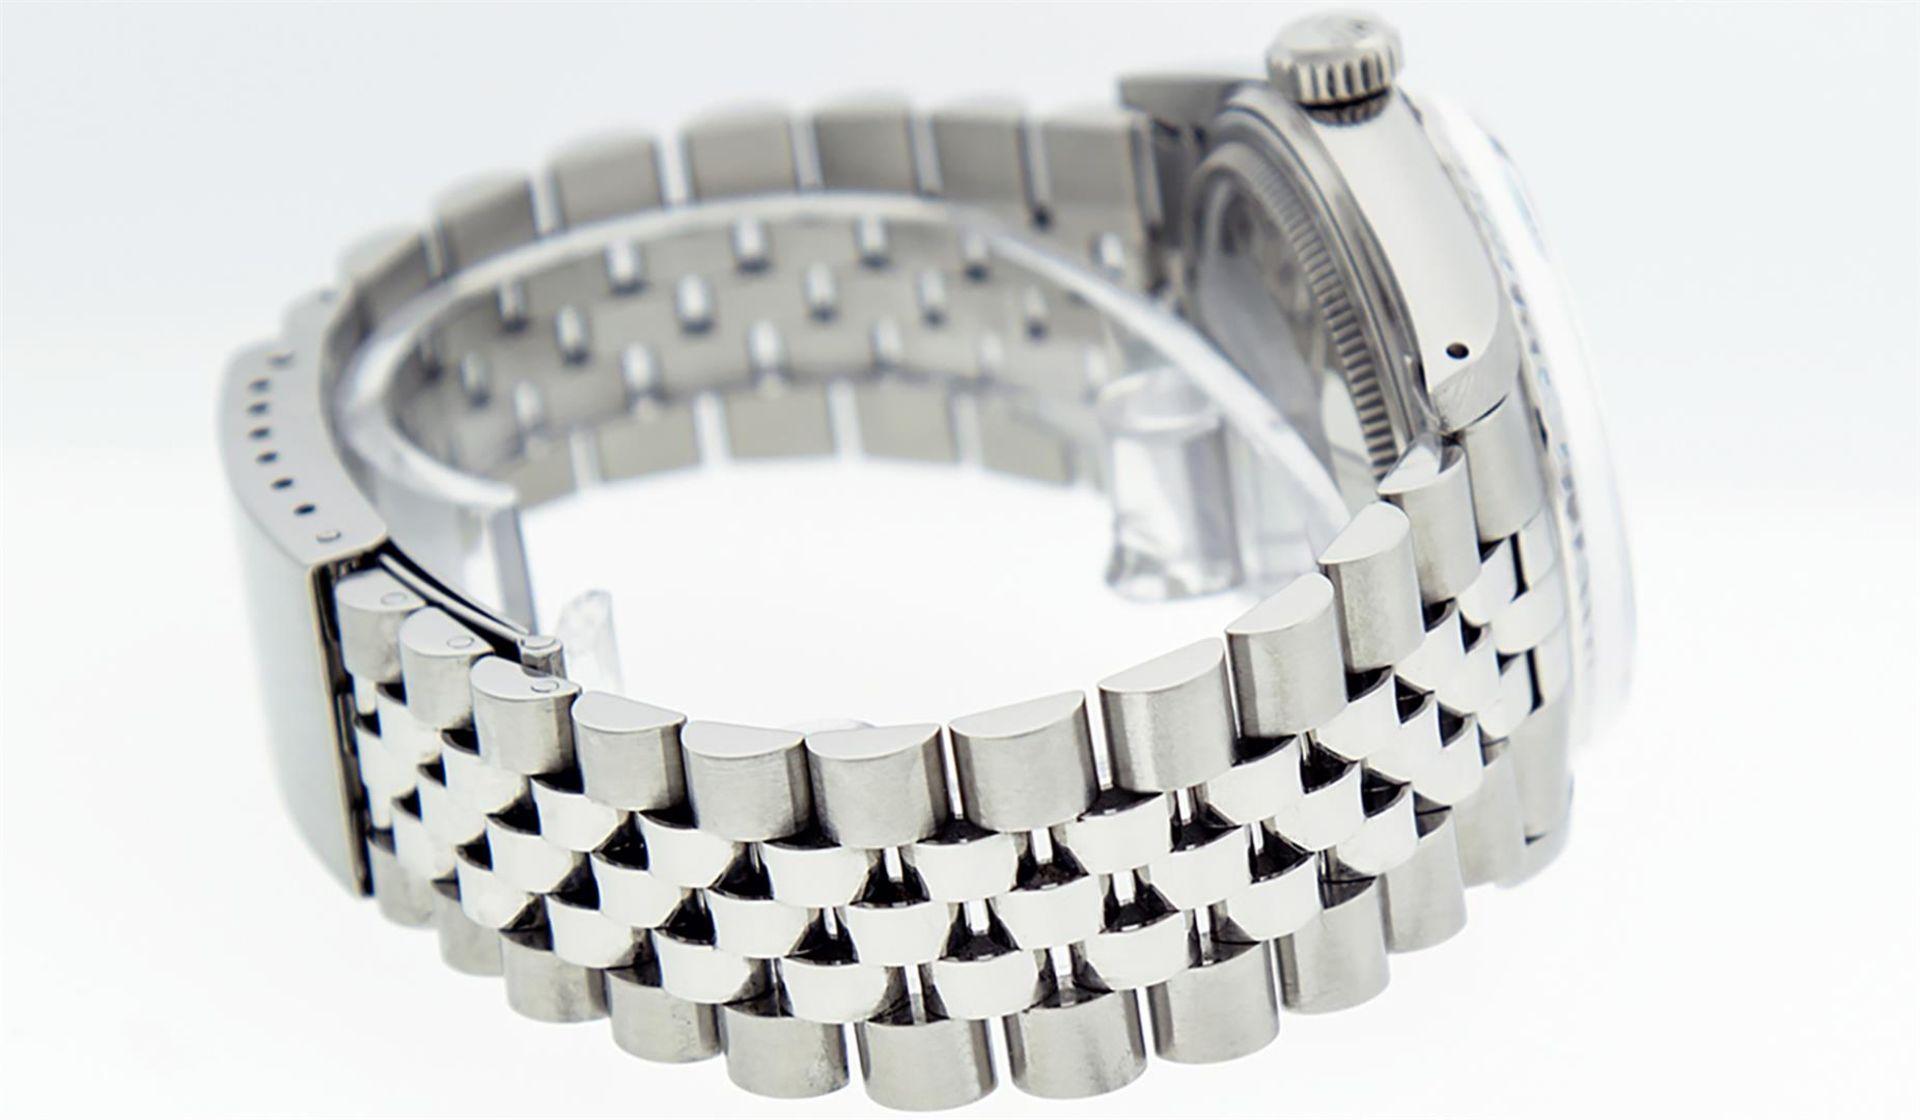 Rolex Mens Stainless Steel Ice Blue Diamond Datejust Wristwatch - Image 5 of 9